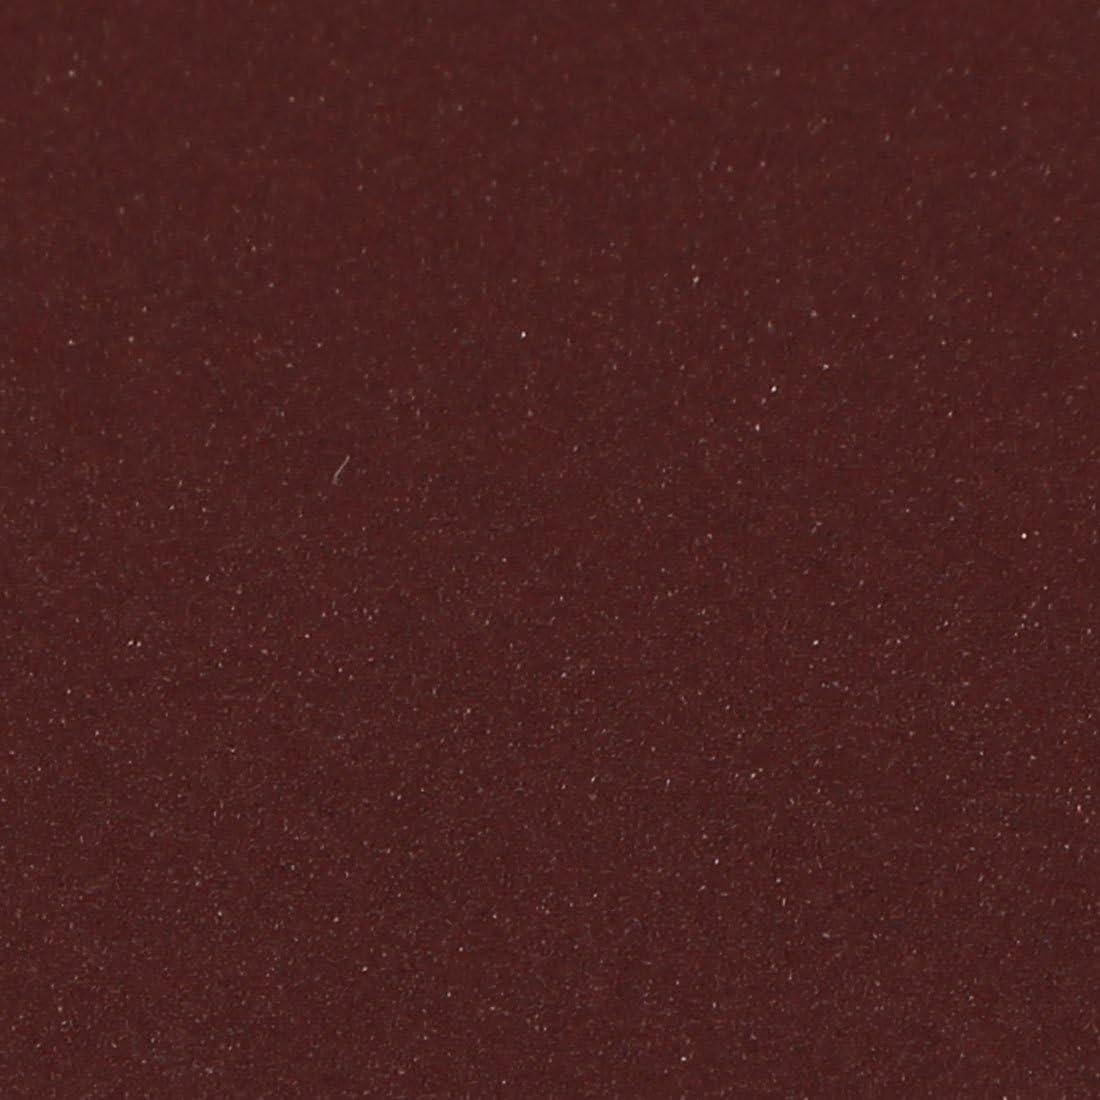 Marr/ón 10 Pcs Aexit 18cm Dia 1500 Grit Abrasivo Pulido Gancho y Bucle Lijado Disco model: X2878VIX-2259YC